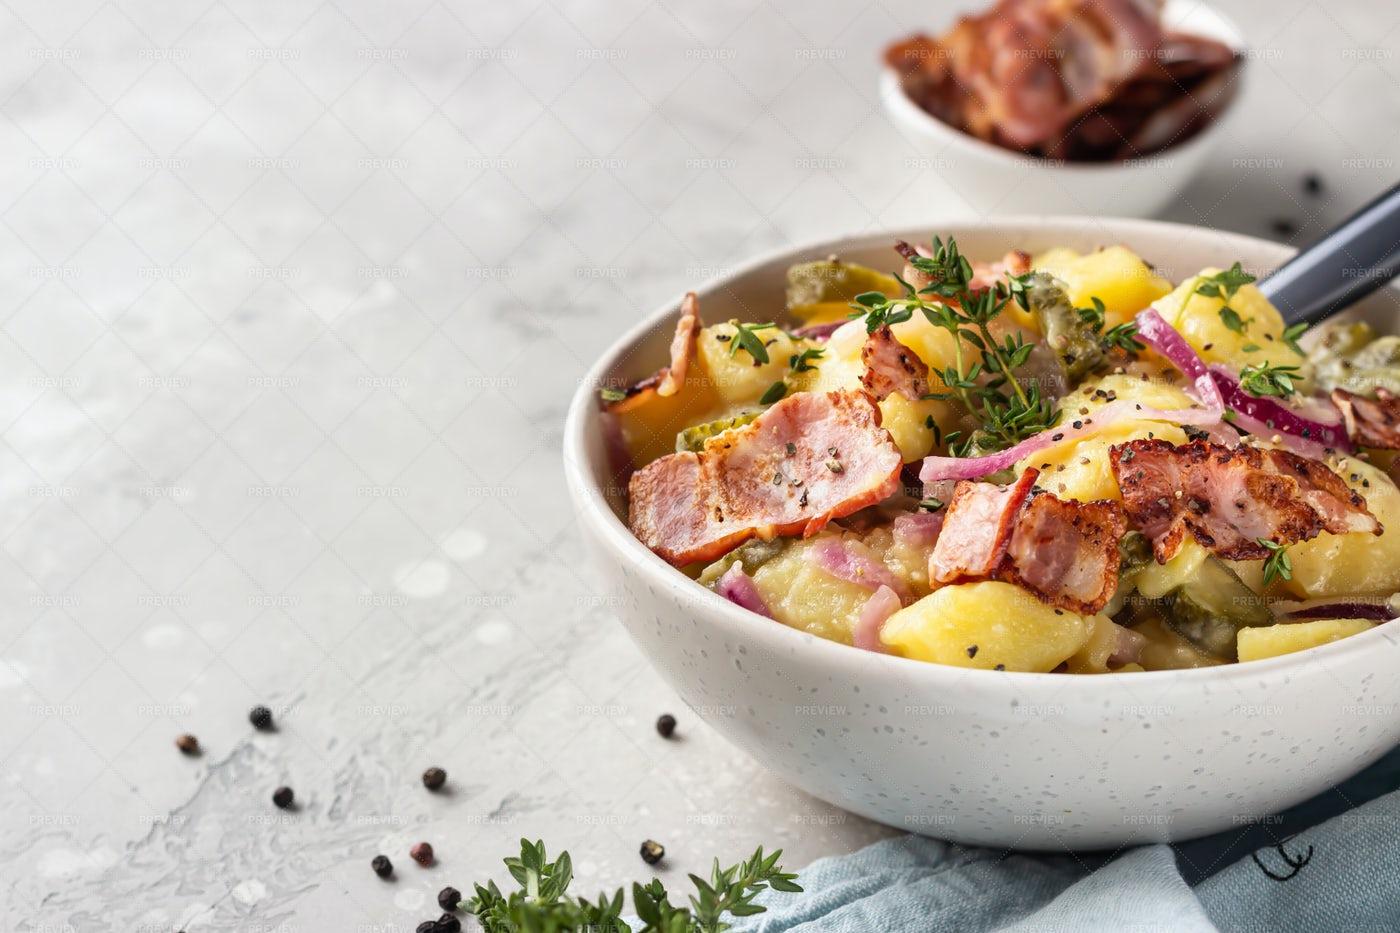 Salad With Potato And Bacon: Stock Photos